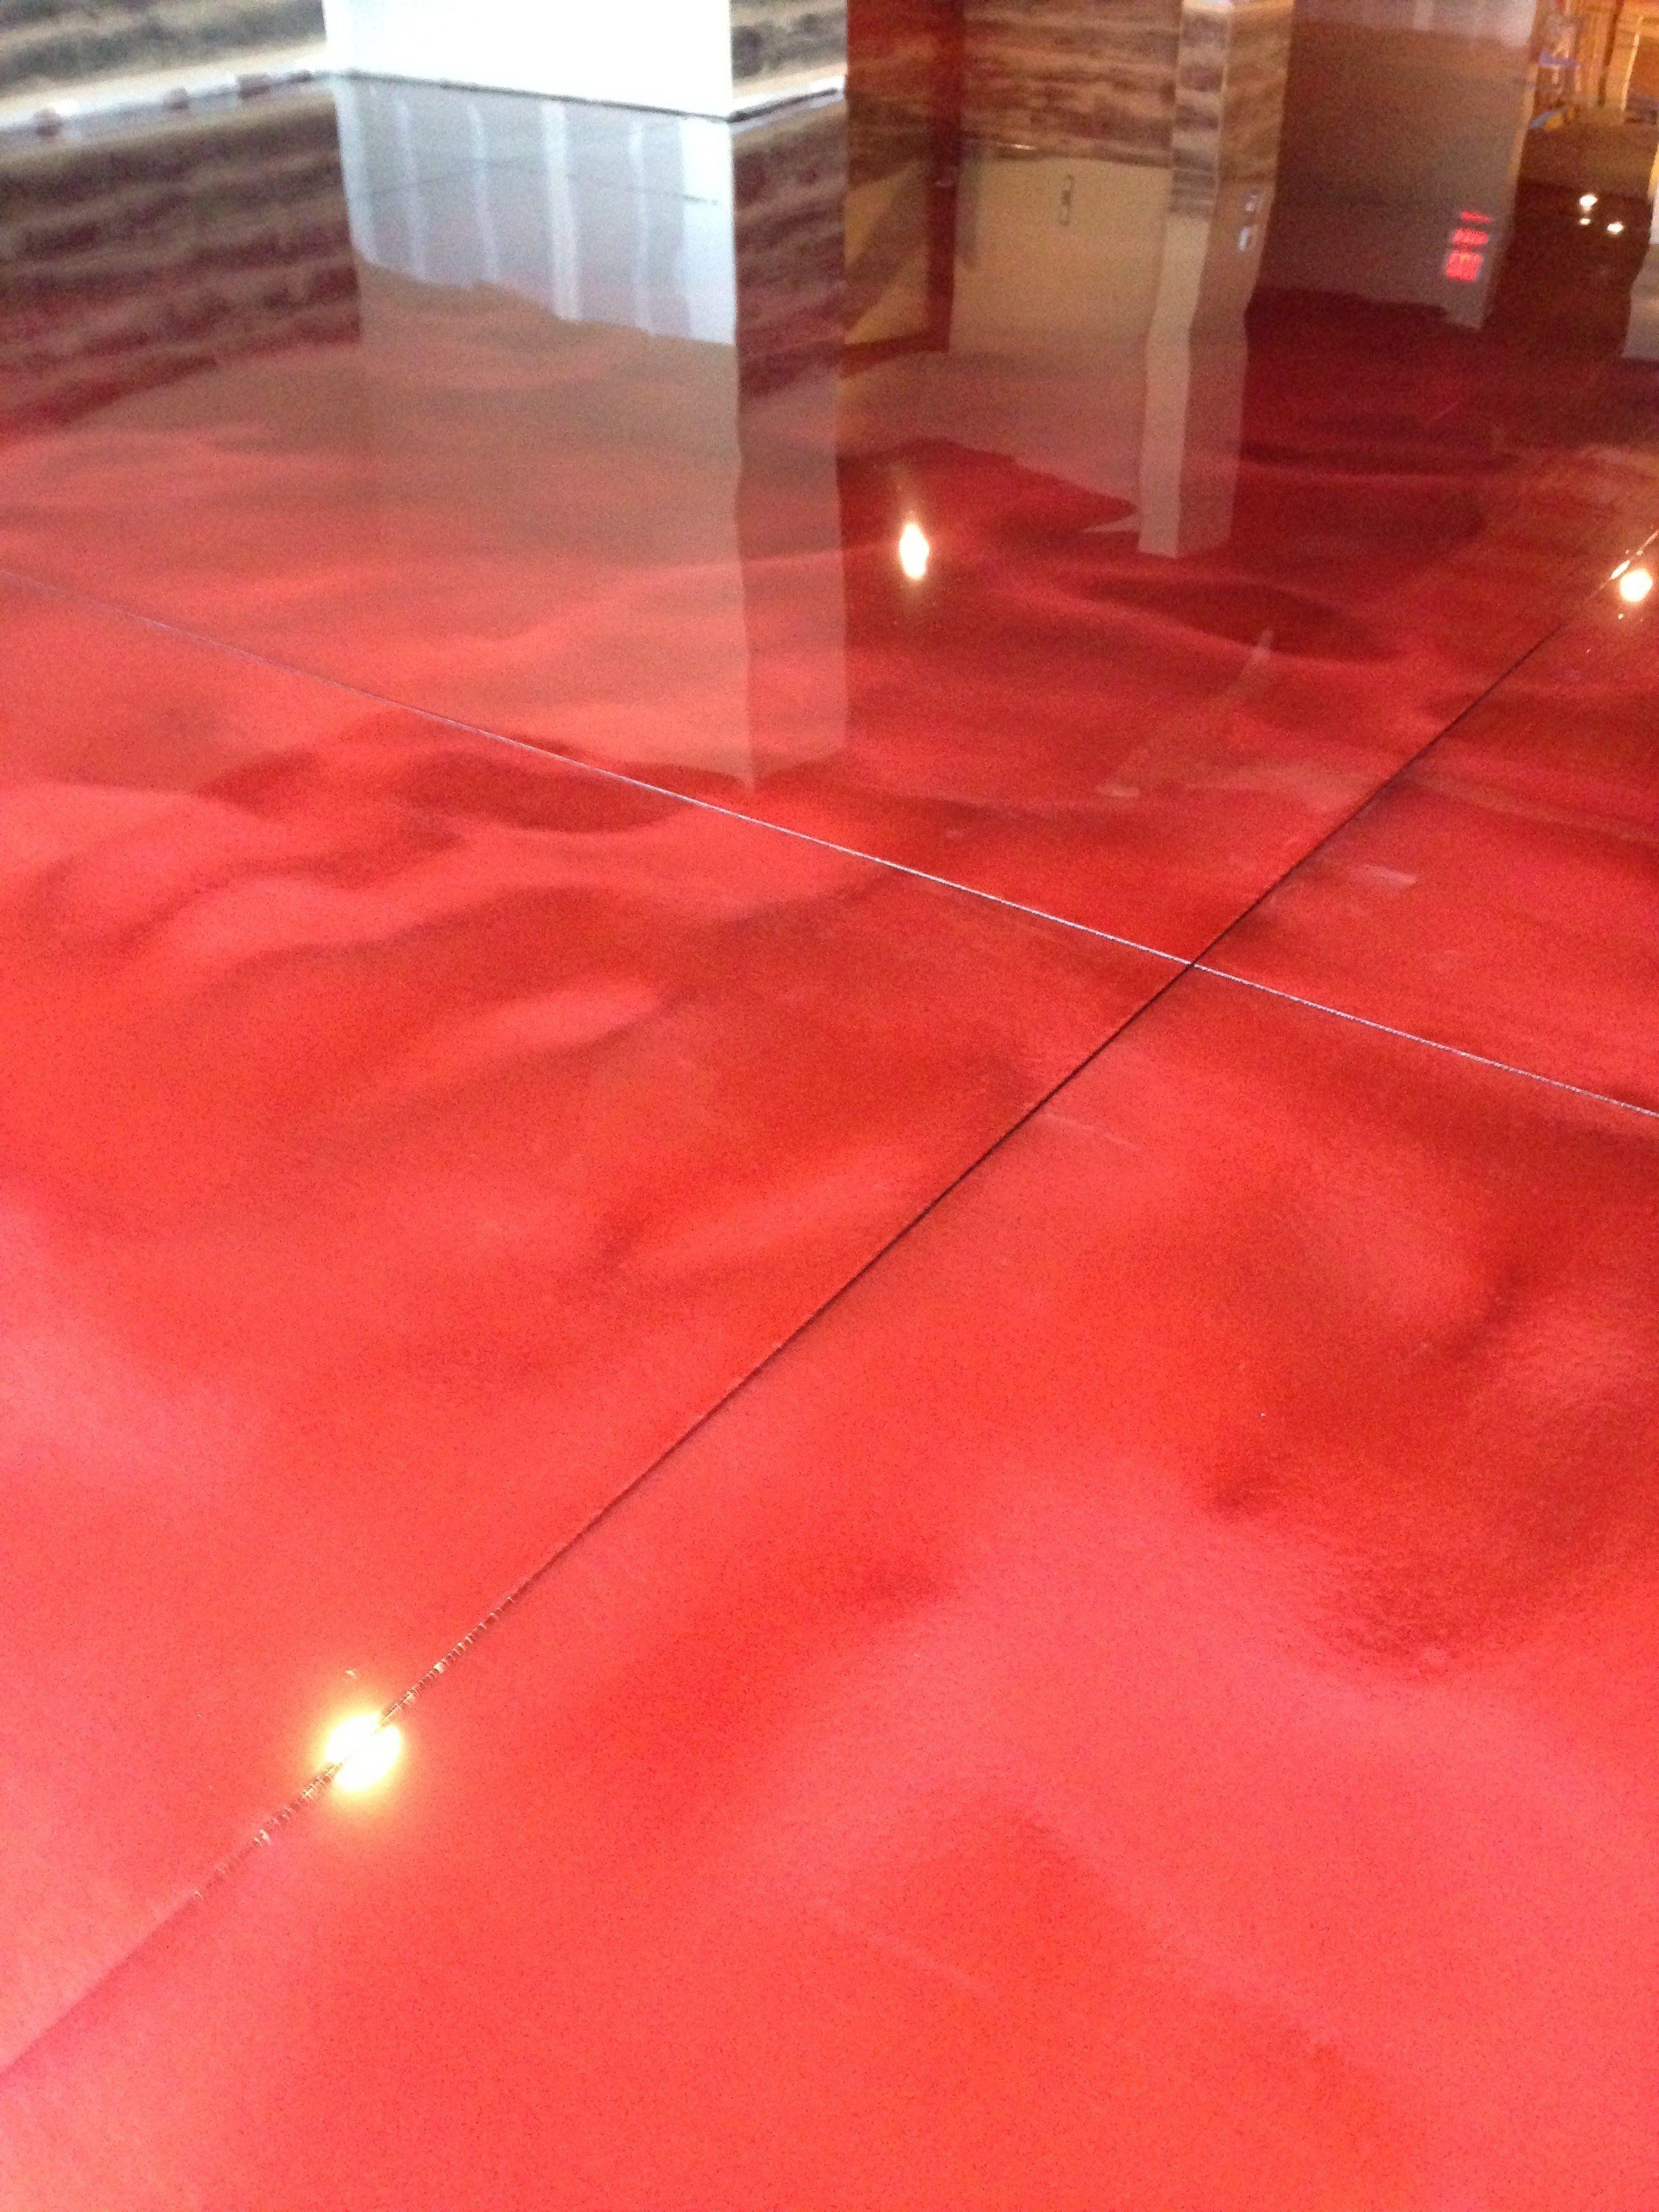 Metallic Red Designer Epoxy Flooring Garage Floor Epoxy Coatings With Metallic Epoxy Garage Floor Diy Metalli Garage Floor Epoxy Garage Floors Diy Diy Flooring